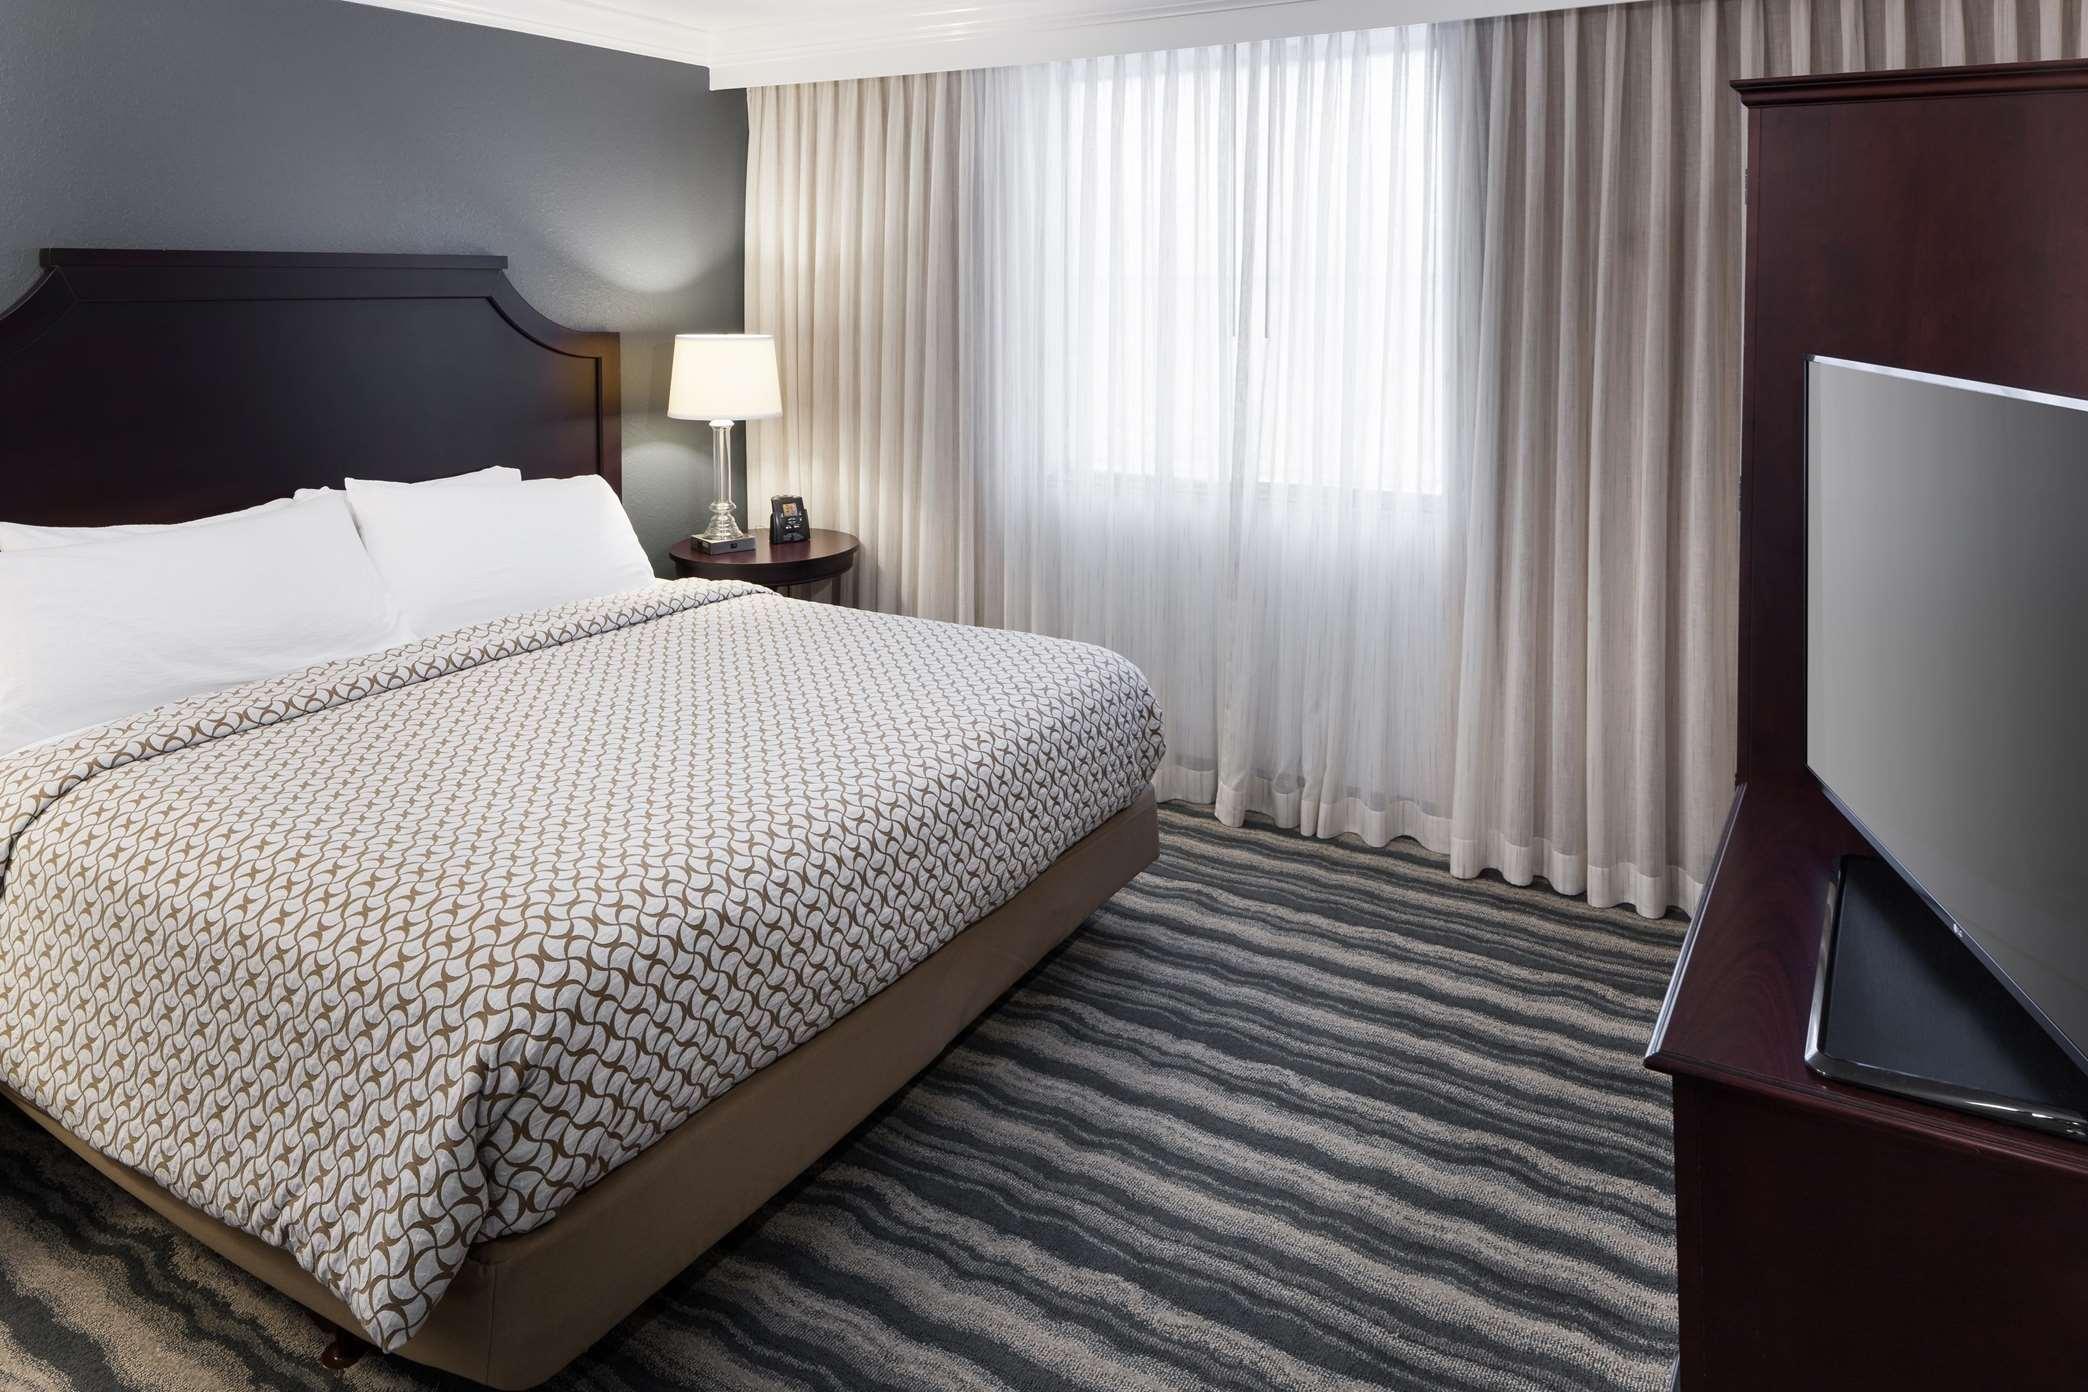 Embassy Suites by Hilton Tampa Brandon image 25